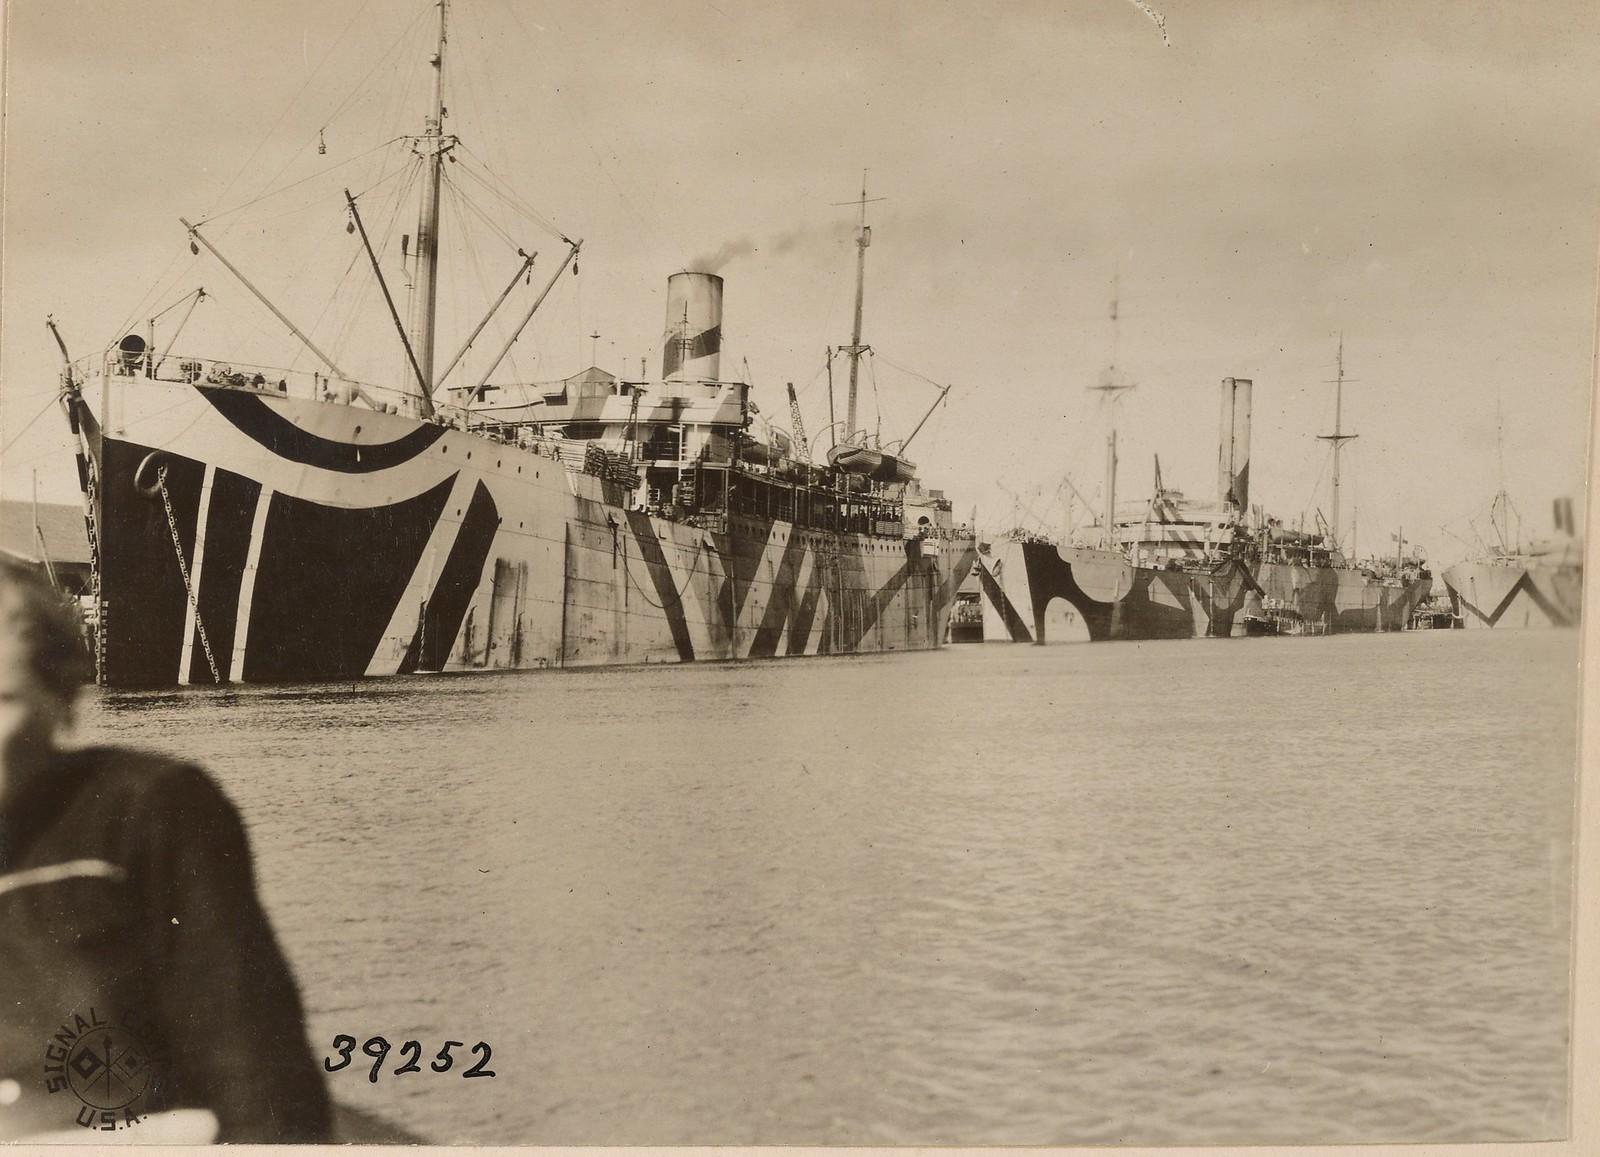 04. Бакарица. Транспорт в гавани после высадки